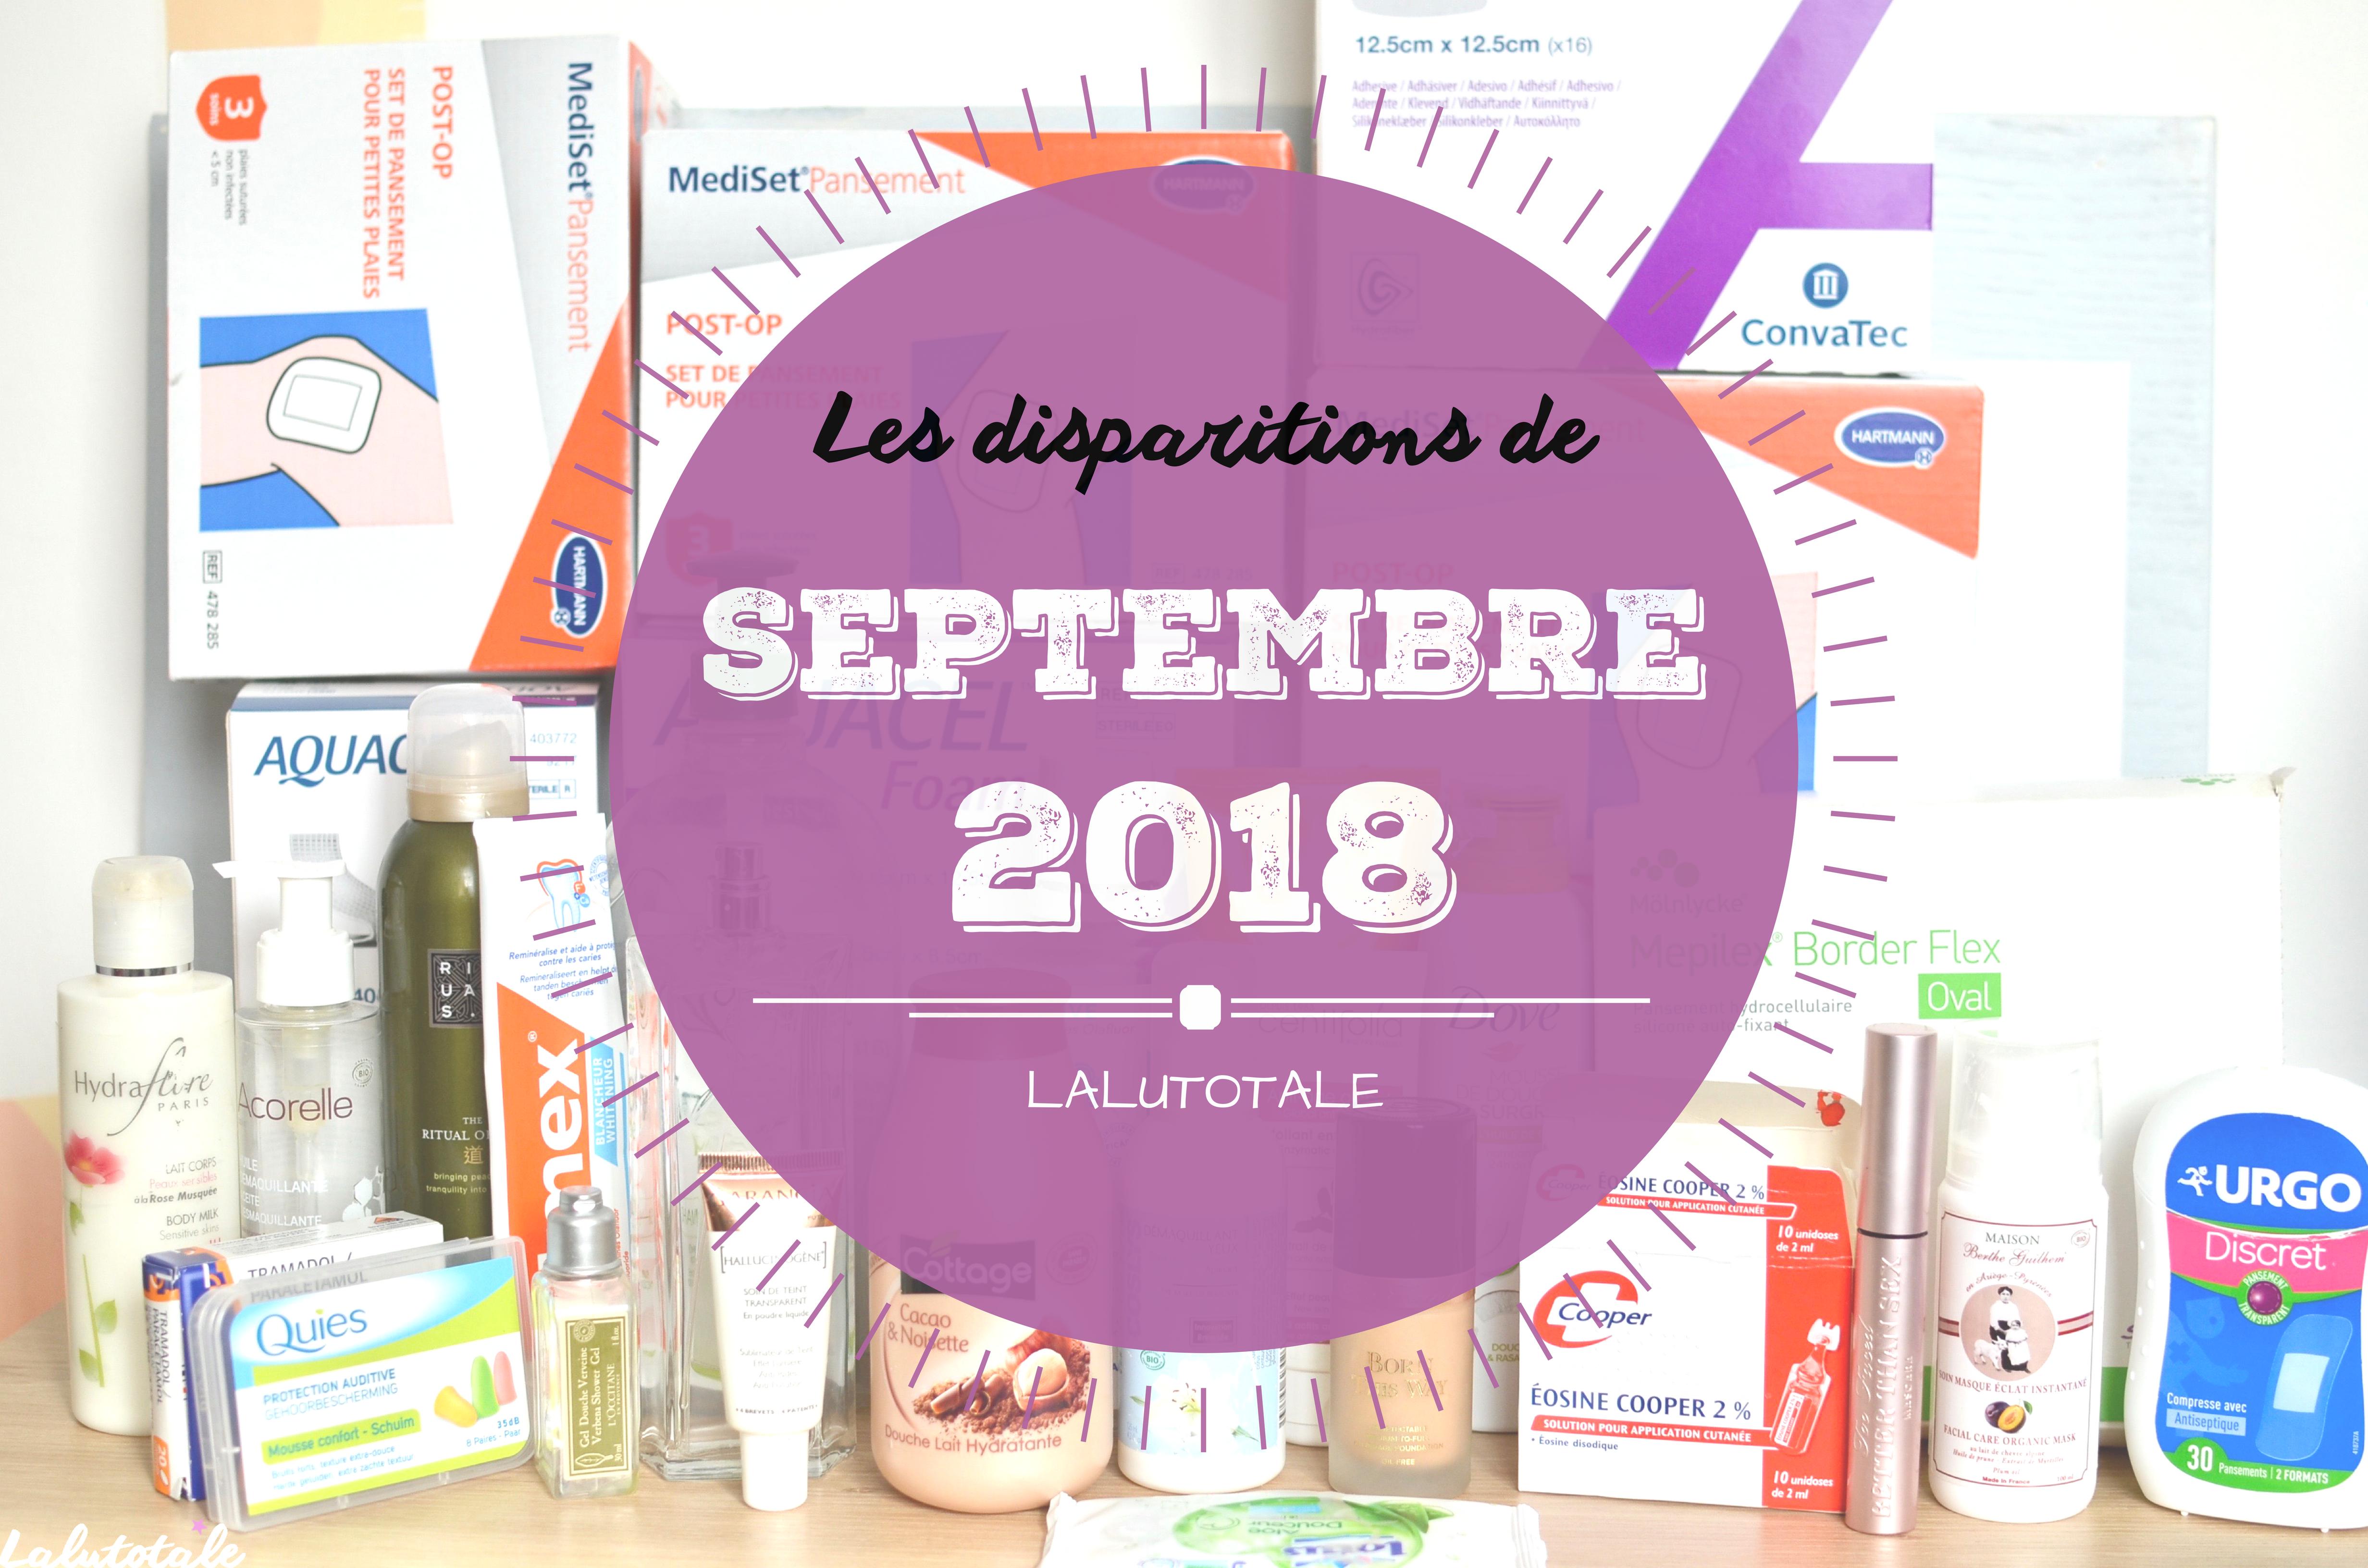 ✞ Les disparitions de Septembre 2018 ✞